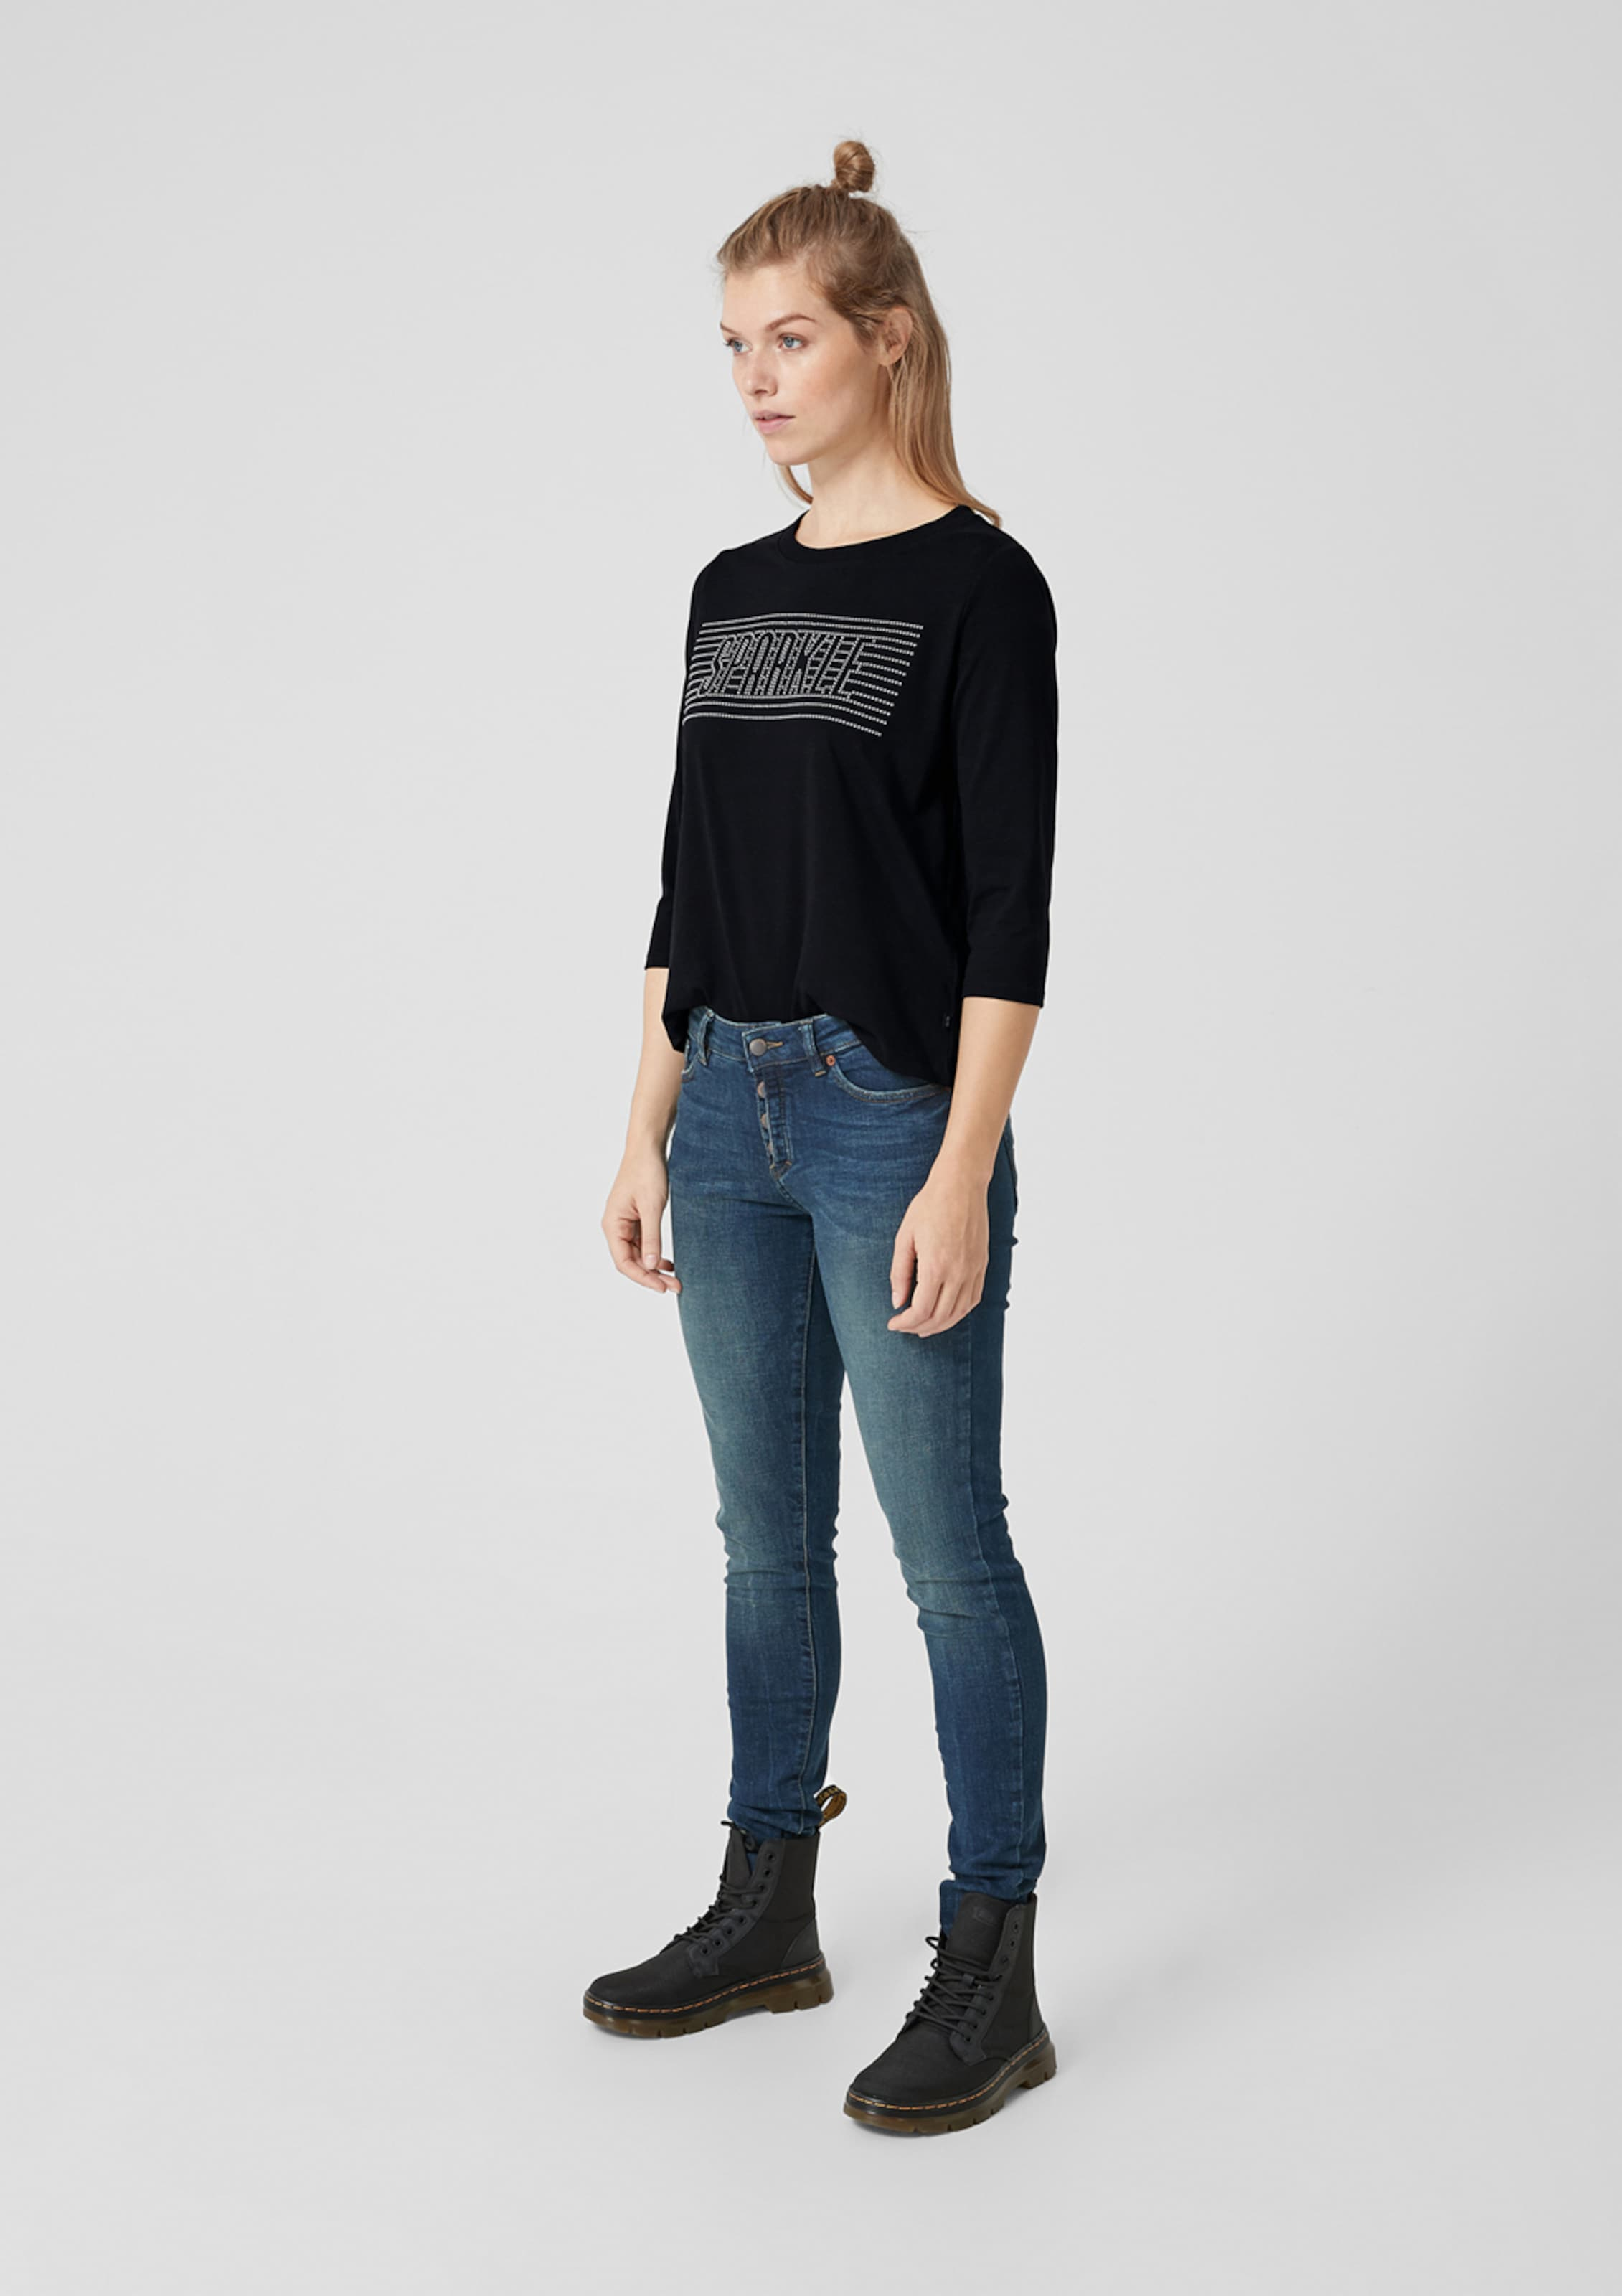 Designed Q In Schwarz Jerseyshirt s By 1J3cKTFul5